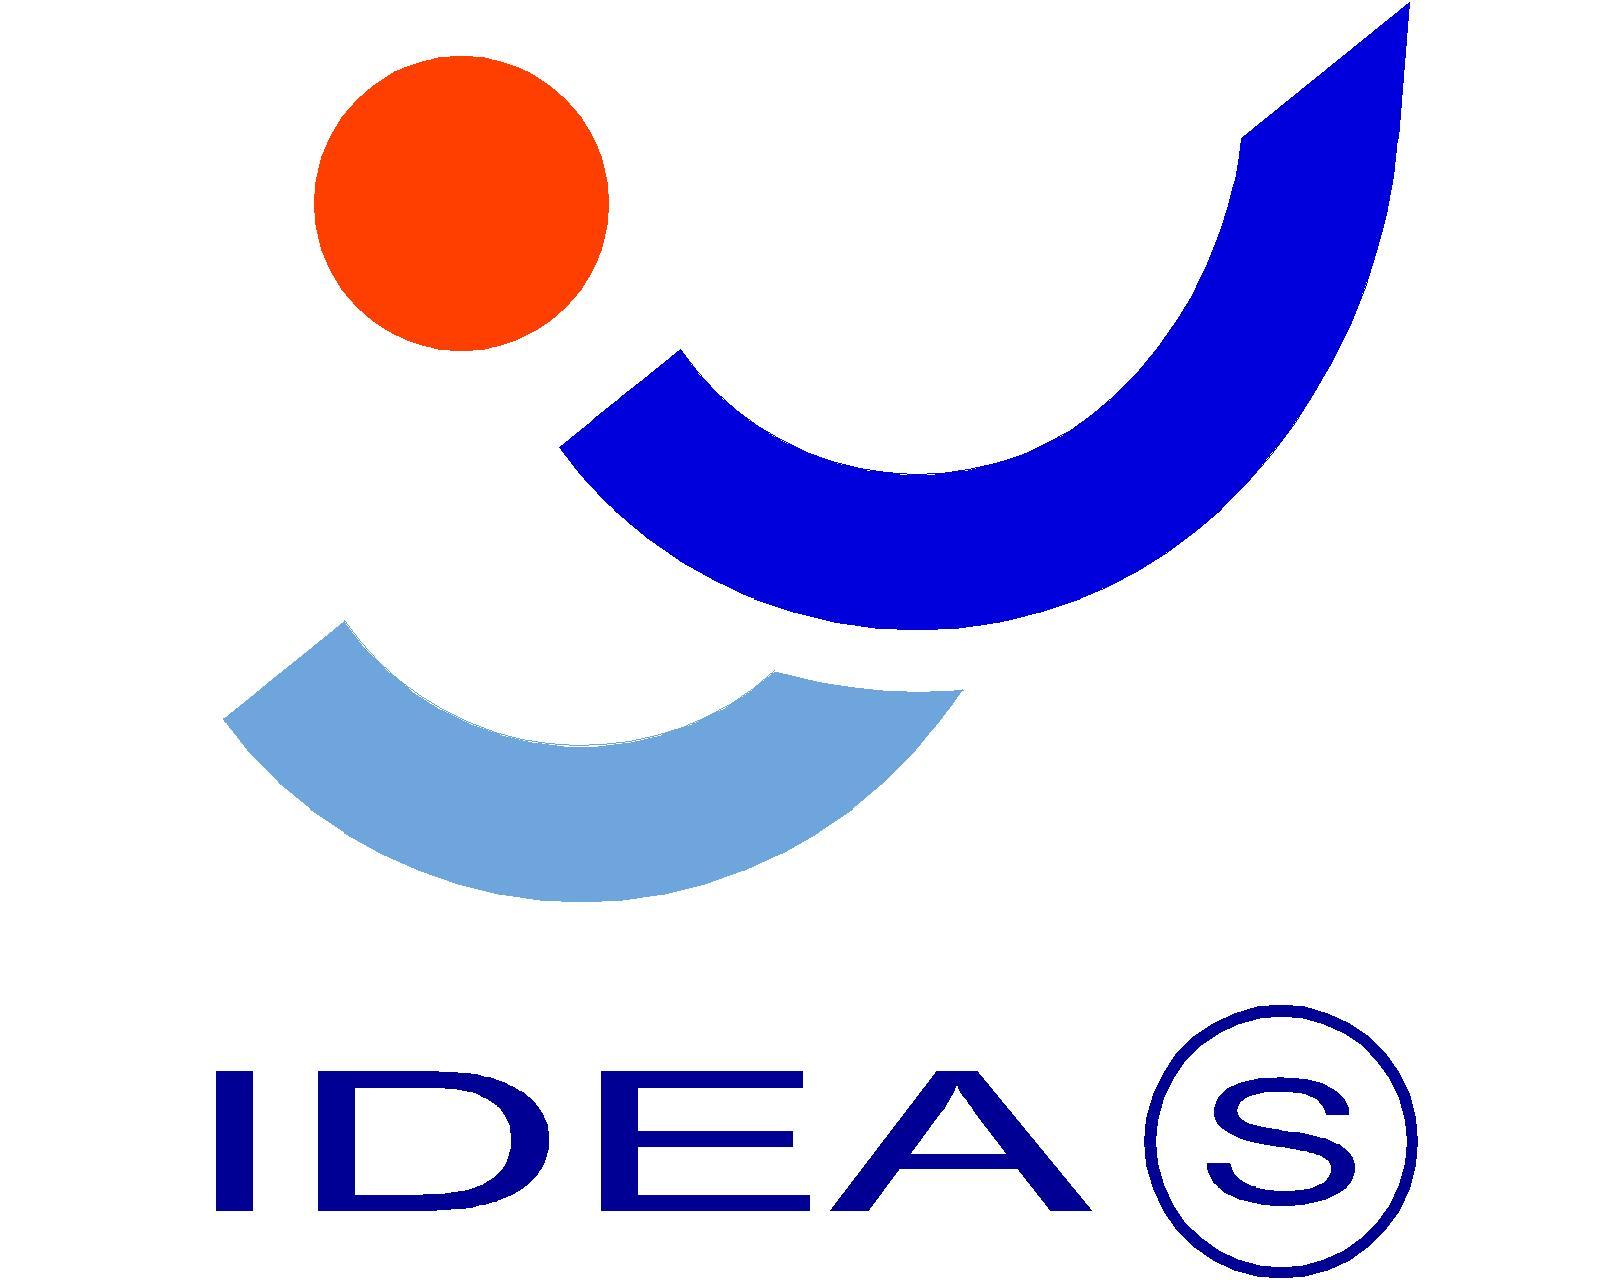 IDEA.S